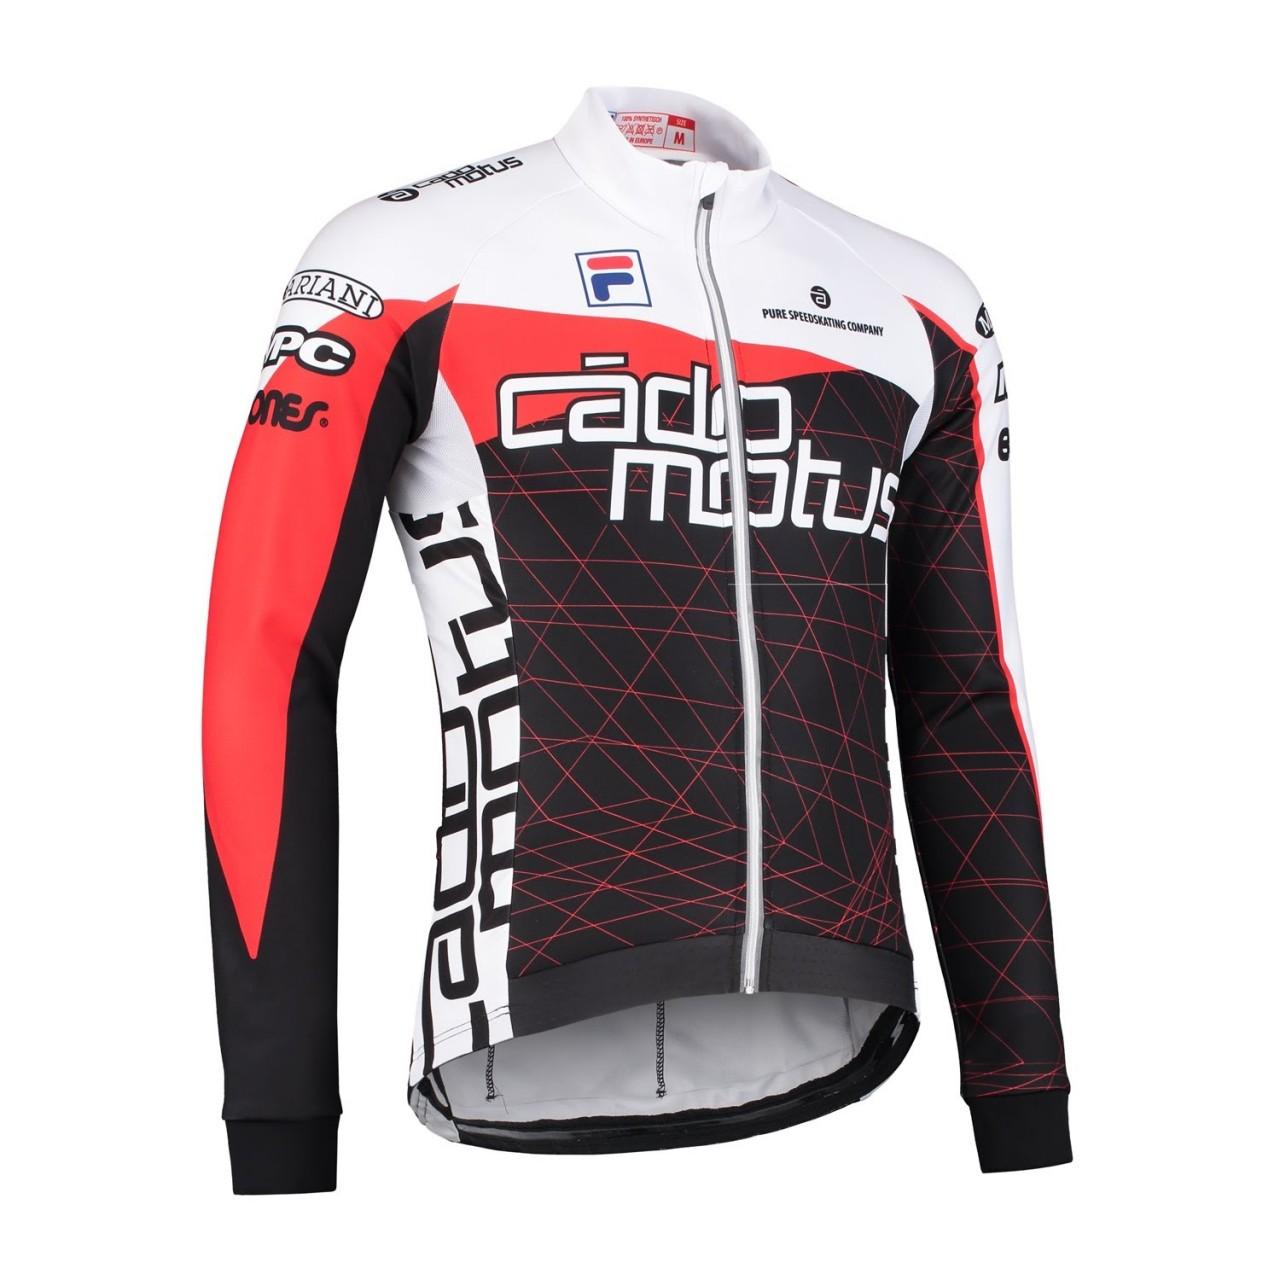 Cádo Motus Team Jacke in Rot 4-season-jacket